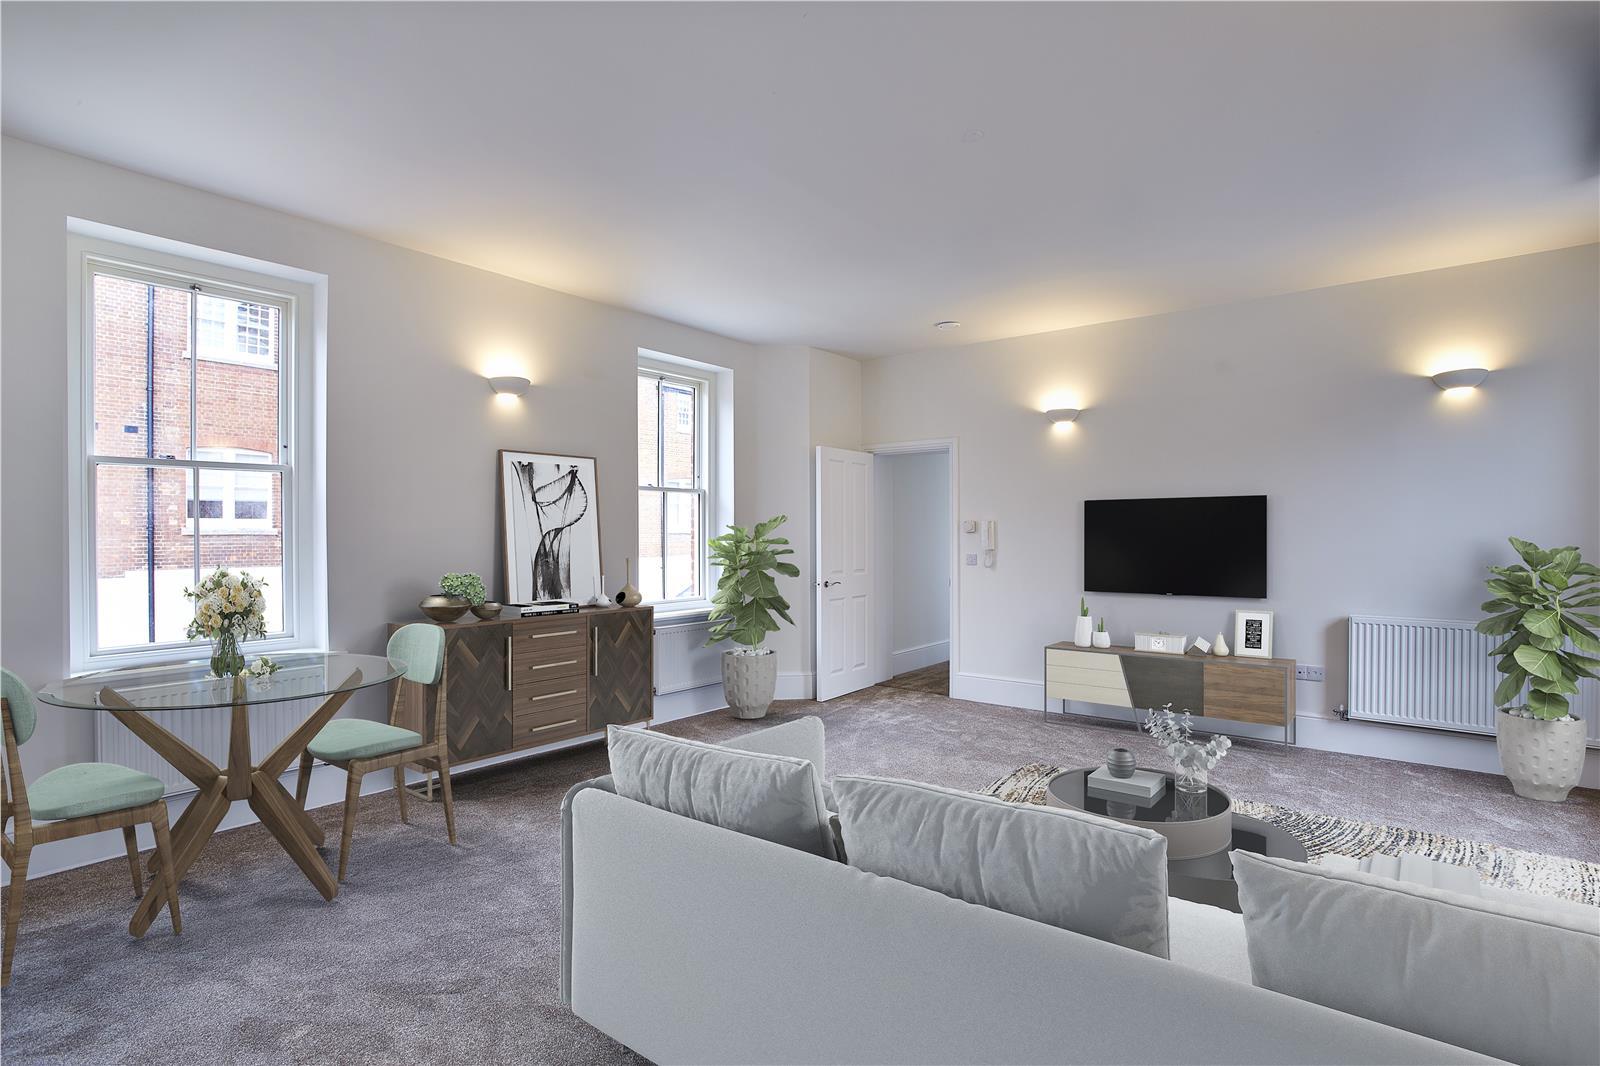 Fair Mile at Cholsey Meadows - Living room interior